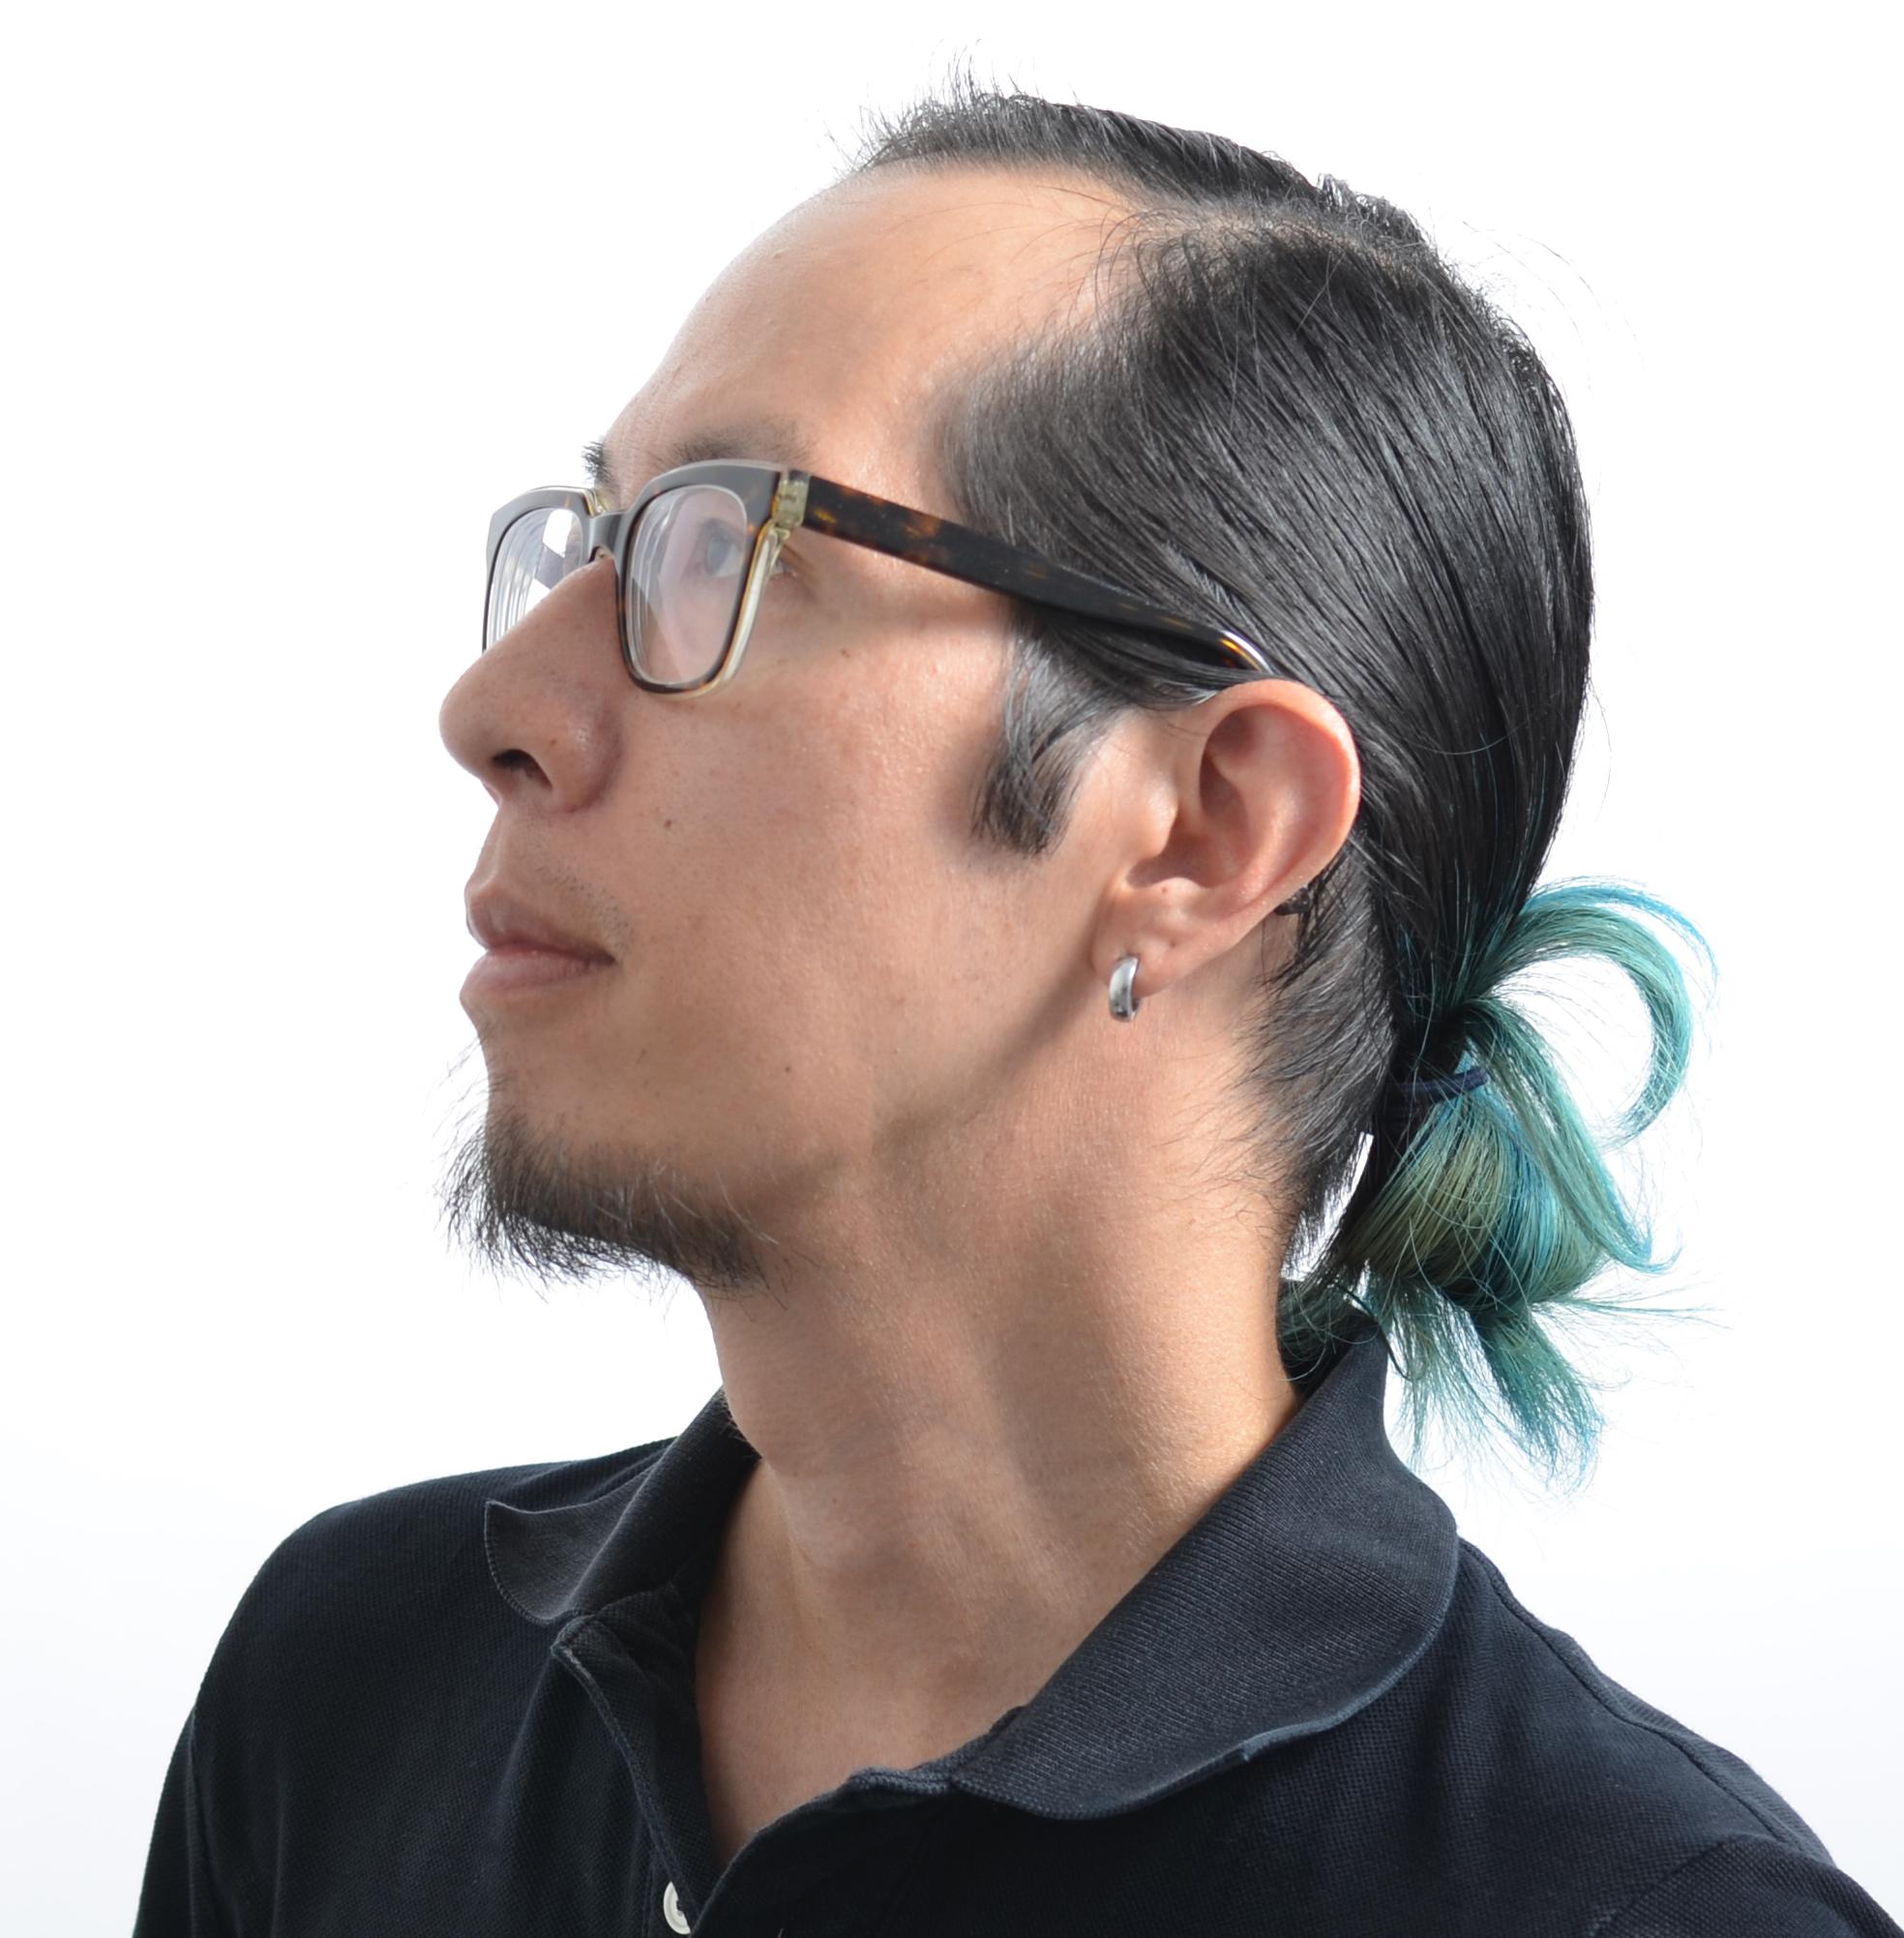 Jiaju Self Portrait 13a.jpg